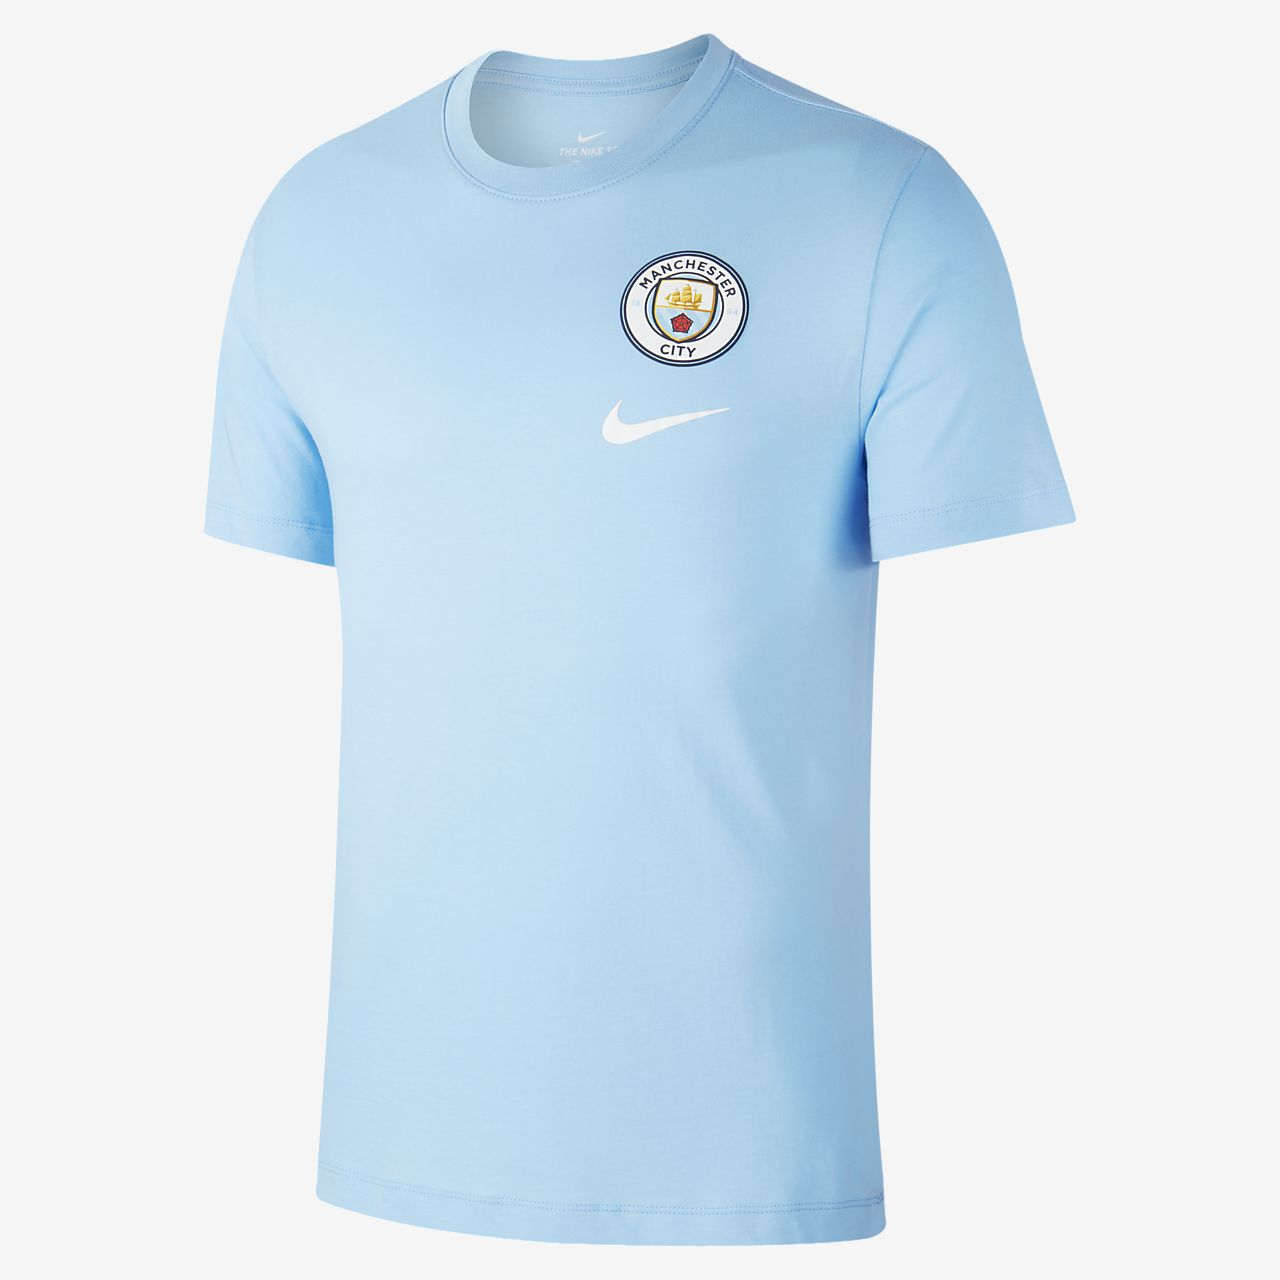 buy online a54dd 1ef50 Men s T-Shirt. Manchester City